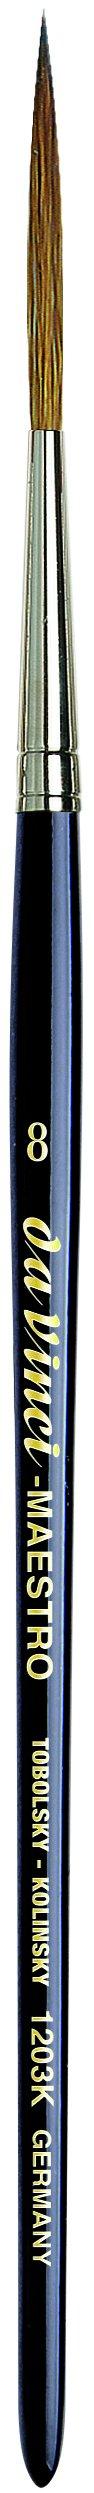 da Vinci Watercolor Series 1203k Maestro Paint Brush, Long Needle Liner/Rigger Kolinsky Red Sable, Size 8 (1203K-08)